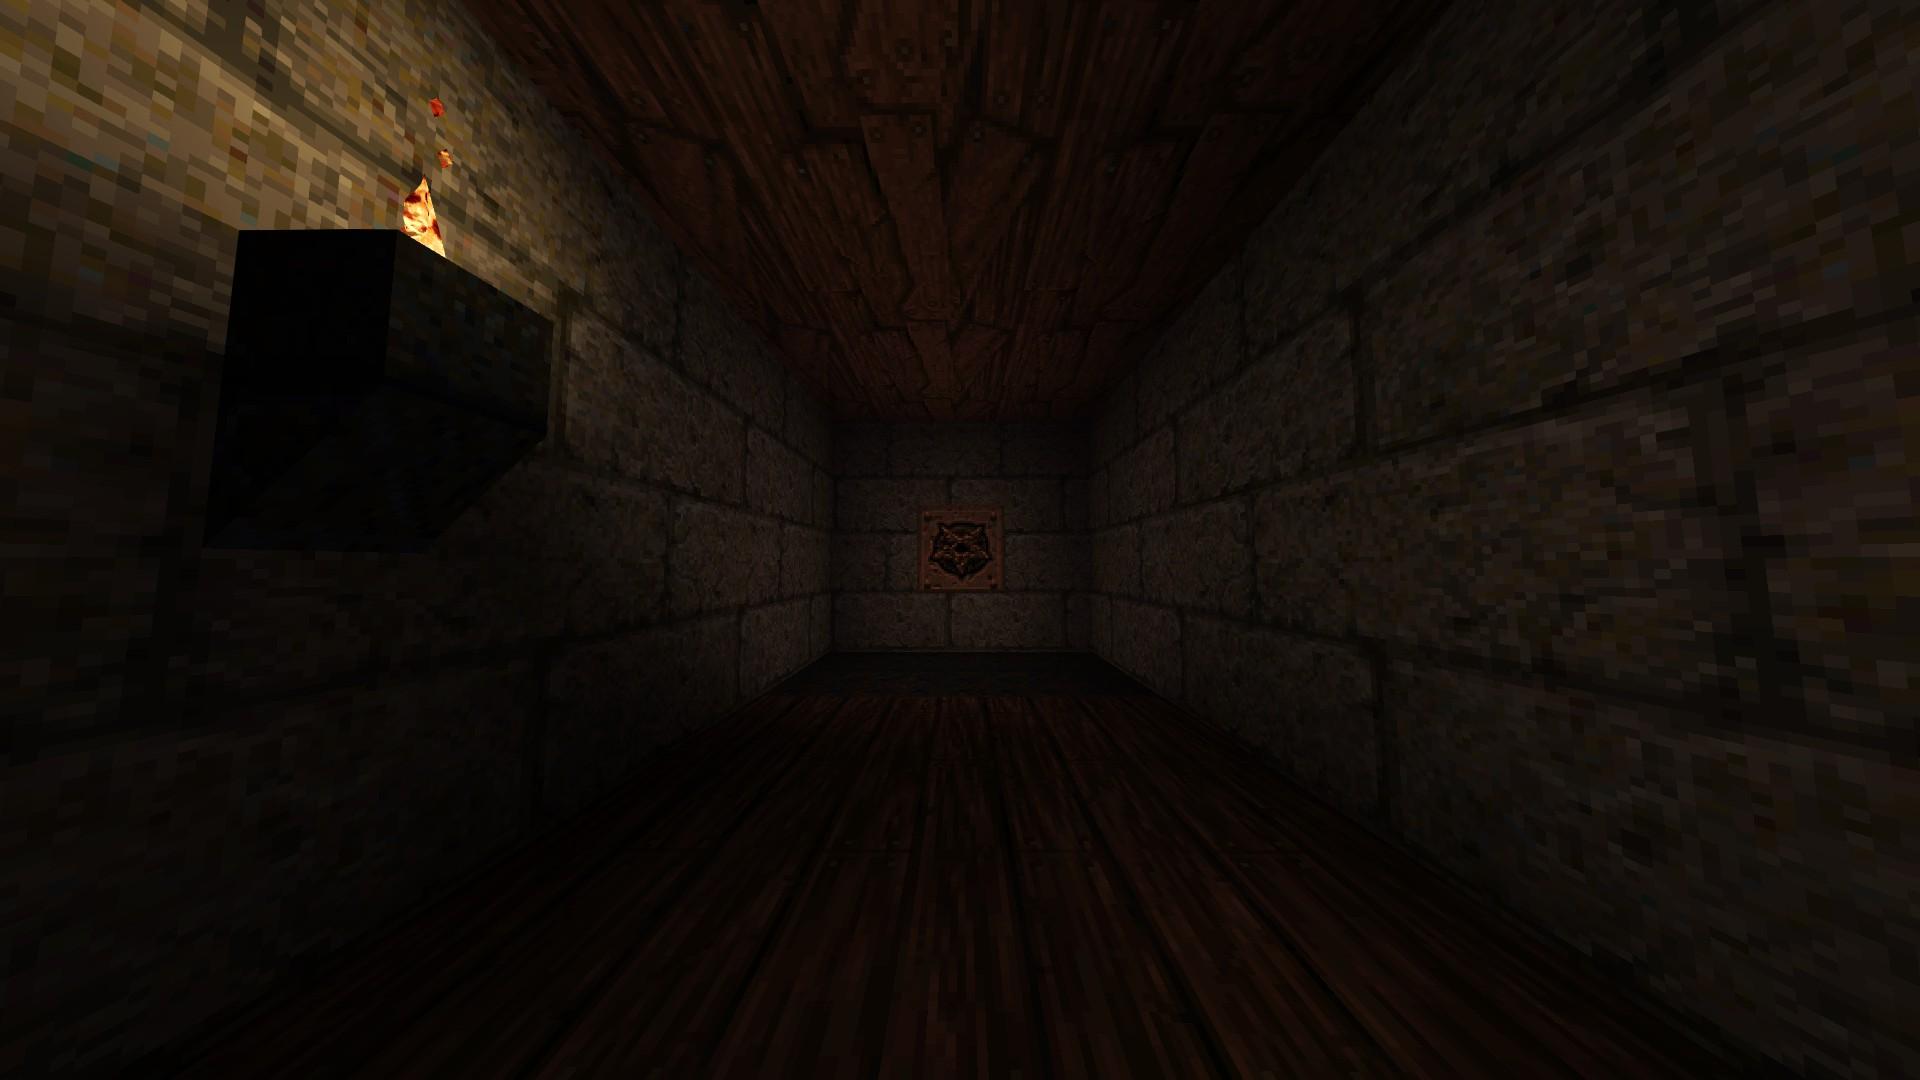 Quake - Locations of All Secrets in Game Tips - E2: Dominion of Darkness - Part I - E098D1F